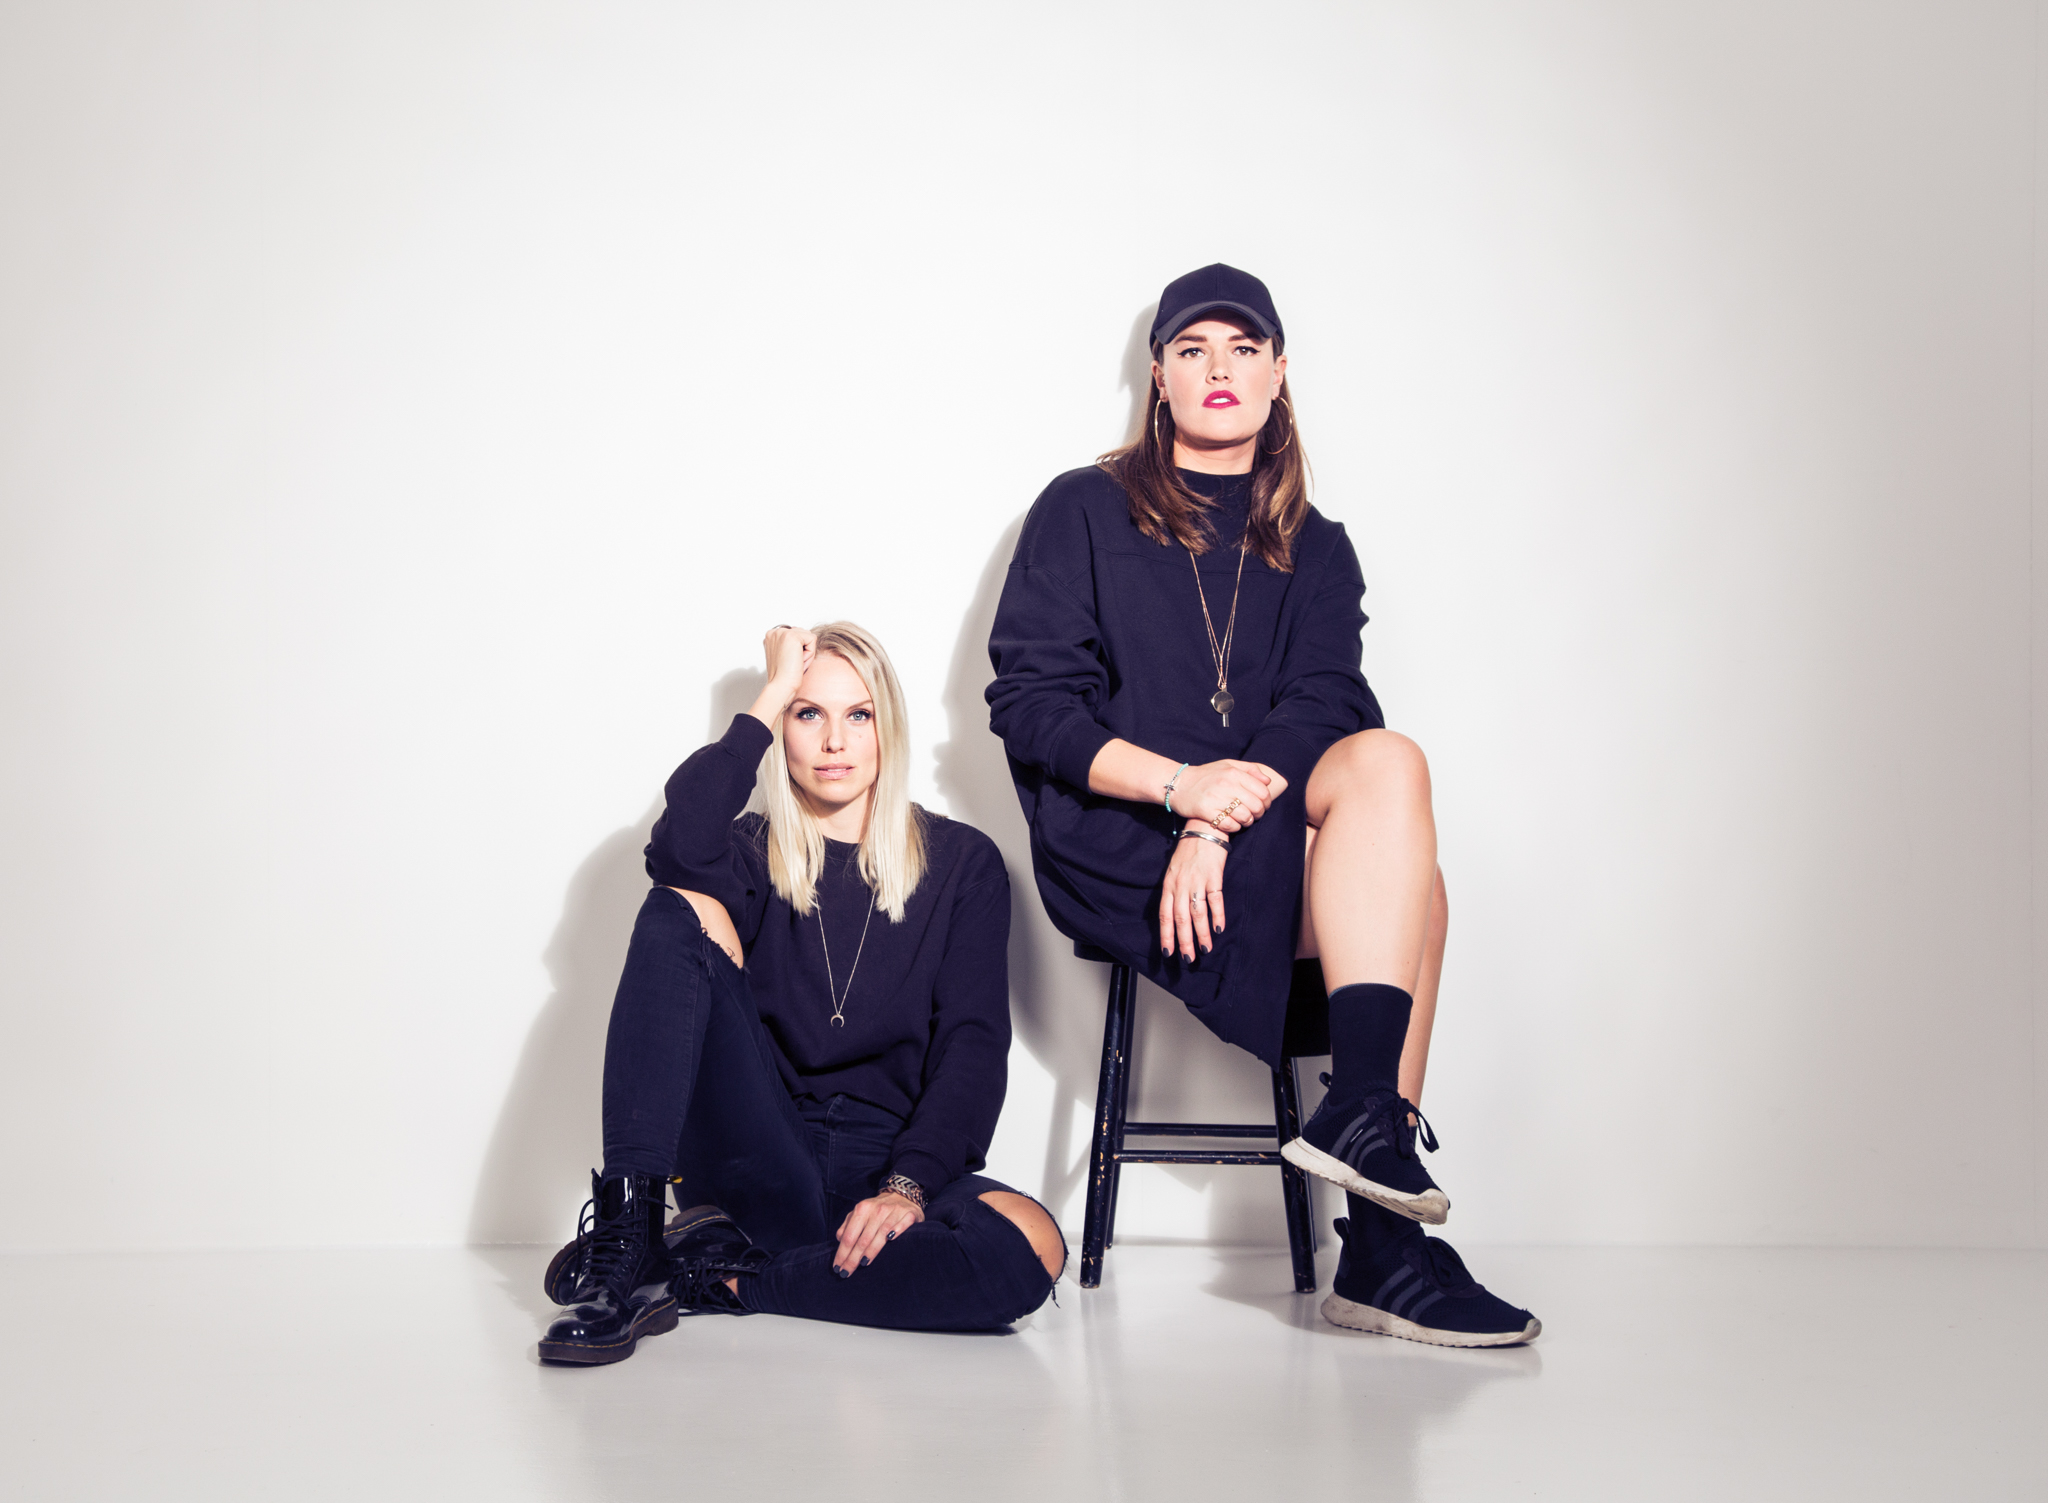 PROMO / Lainto&Karimaa